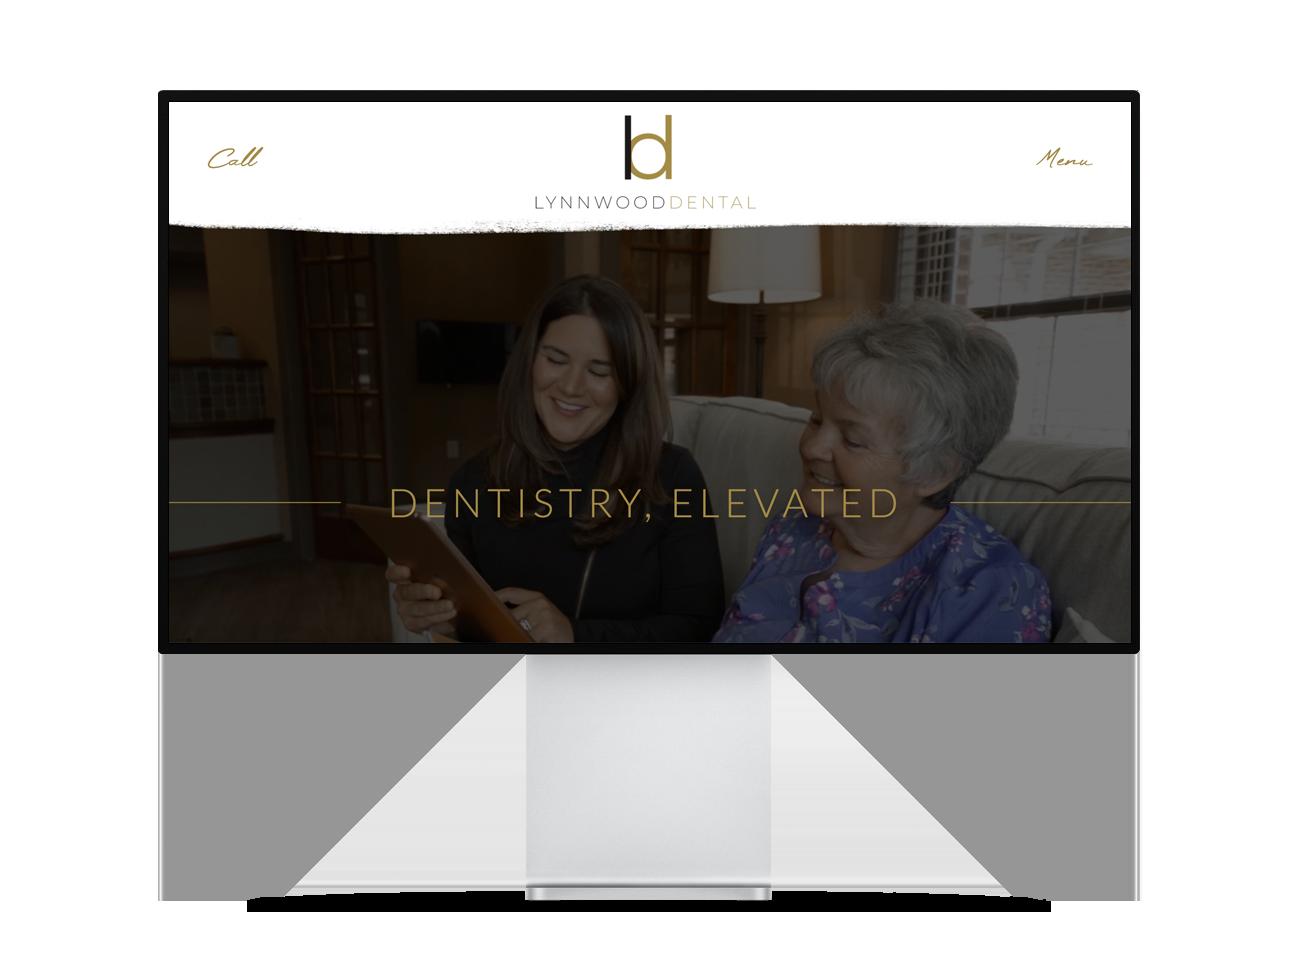 Screenshot of the Lynnwood Dental website